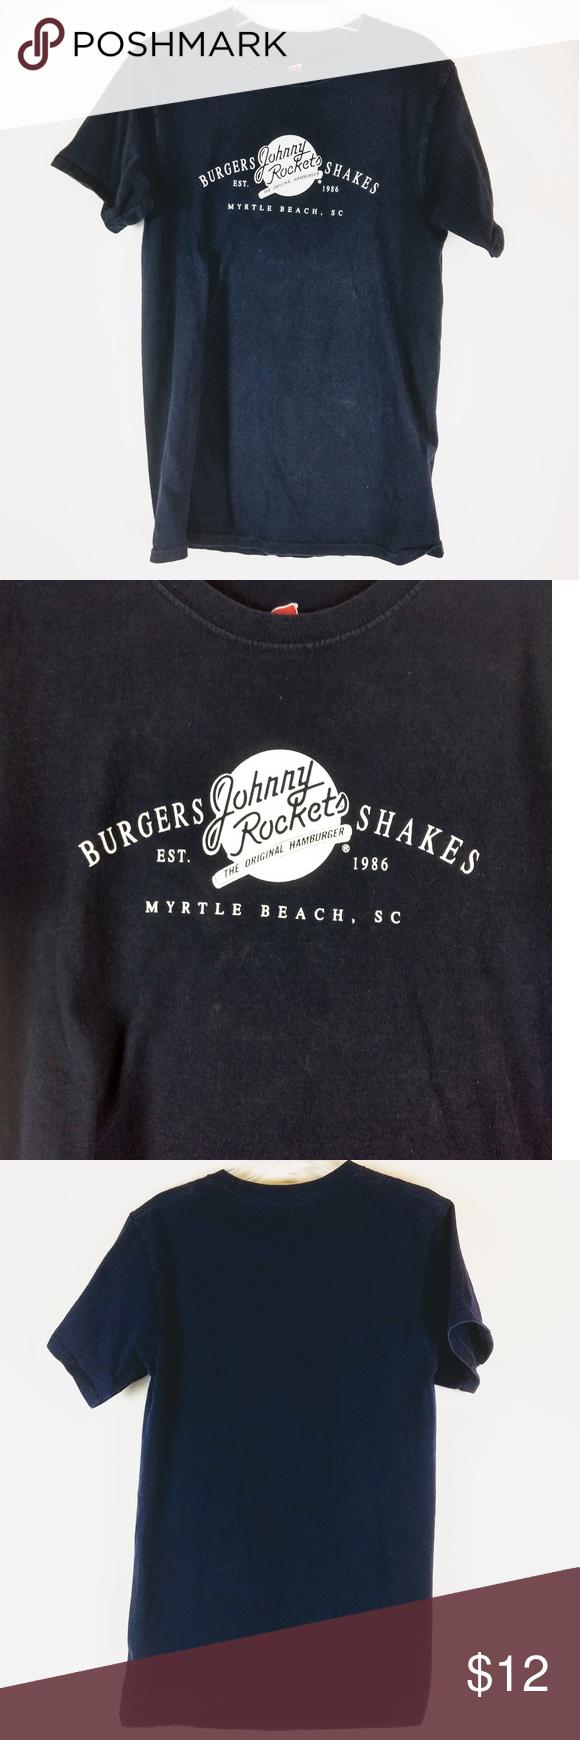 9867fa78fce9 Johnny Rockets Burgers Shakes T-Shirt Myrtle Beach Johnny Rockets Burgers  and Shakes Myrtle Beach South Carolina Souvenir Navy T Shirt Size Small  There is a ...